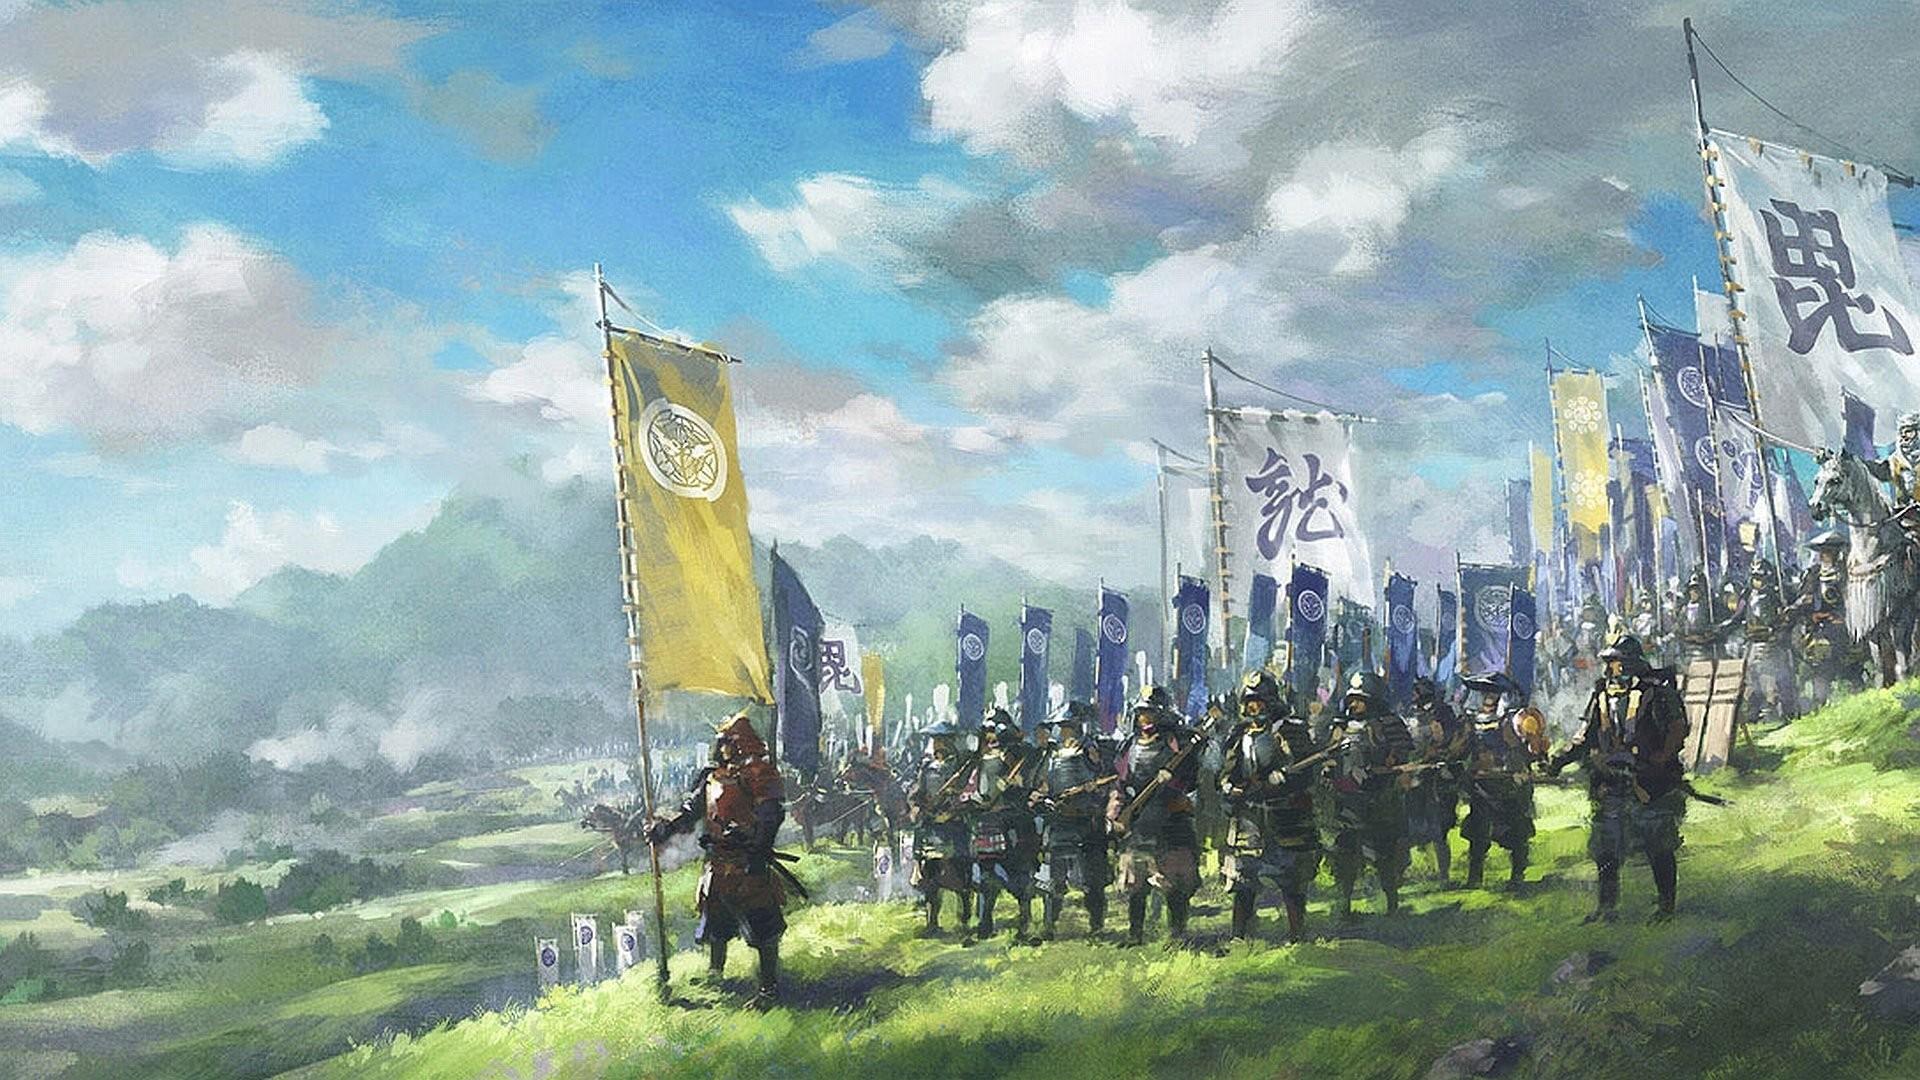 Fantasy – Samurai Wallpaper